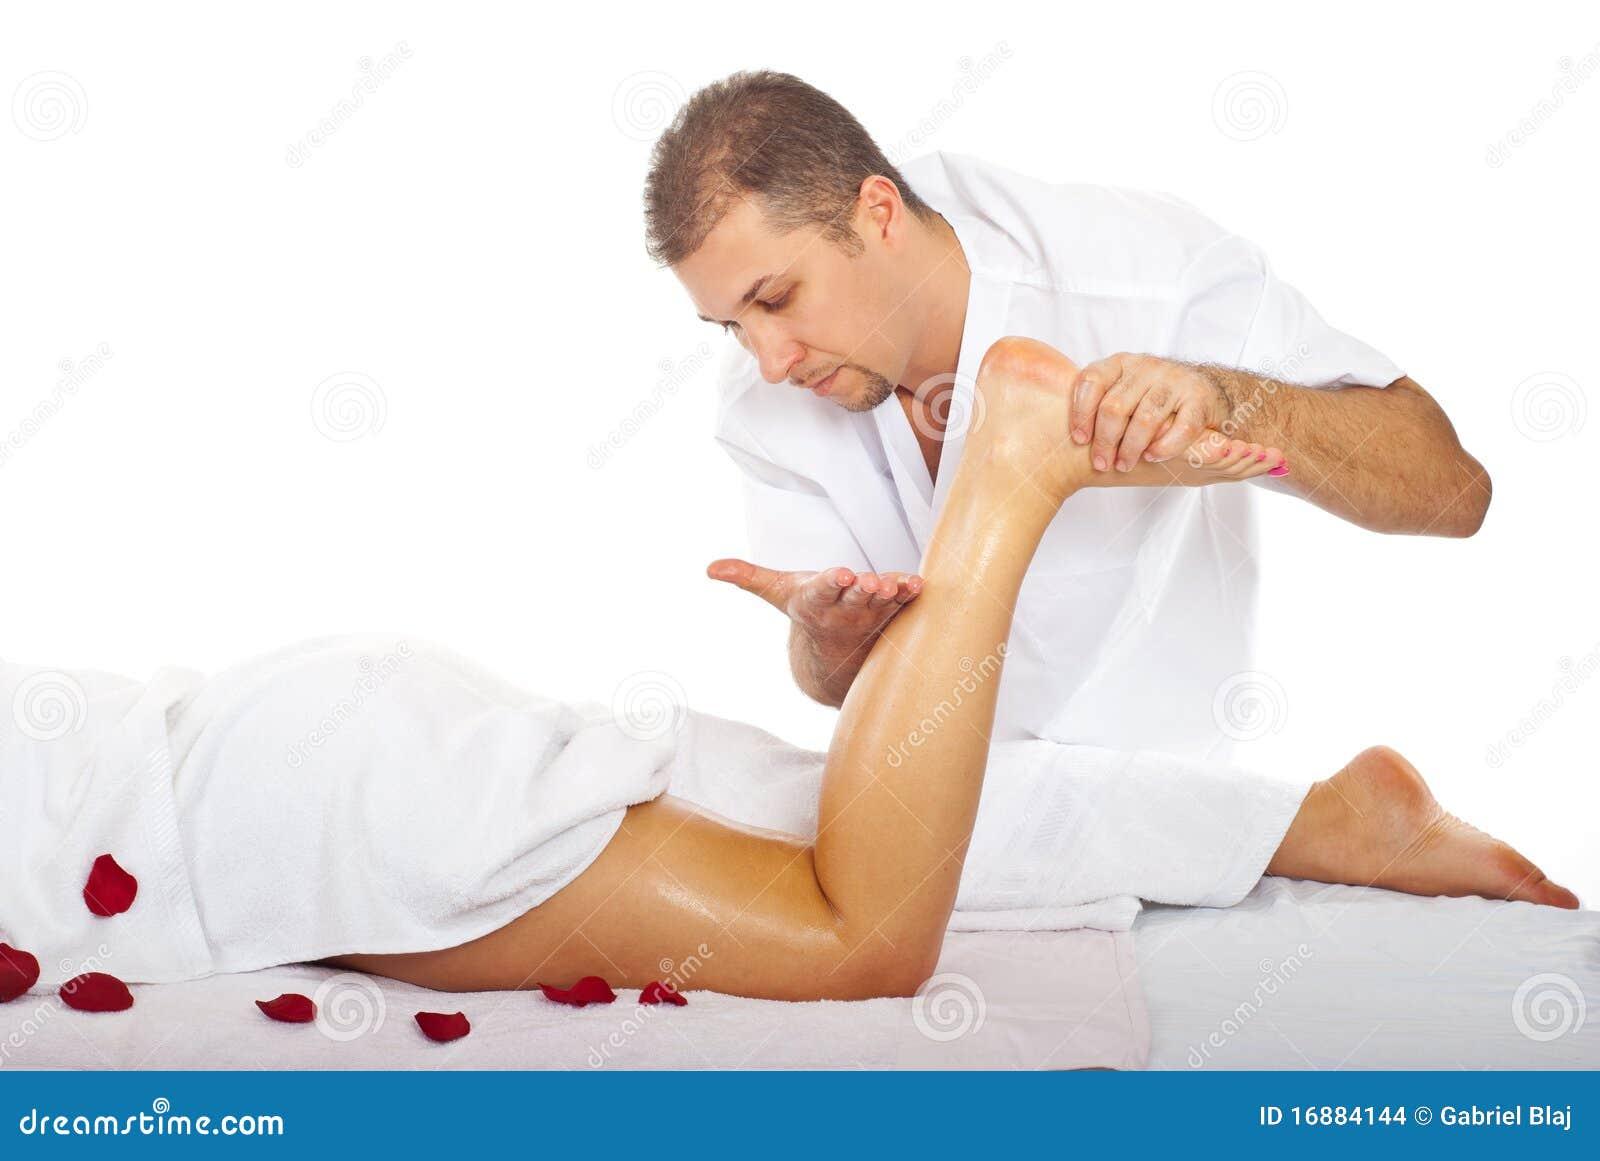 massaging a guy Orange